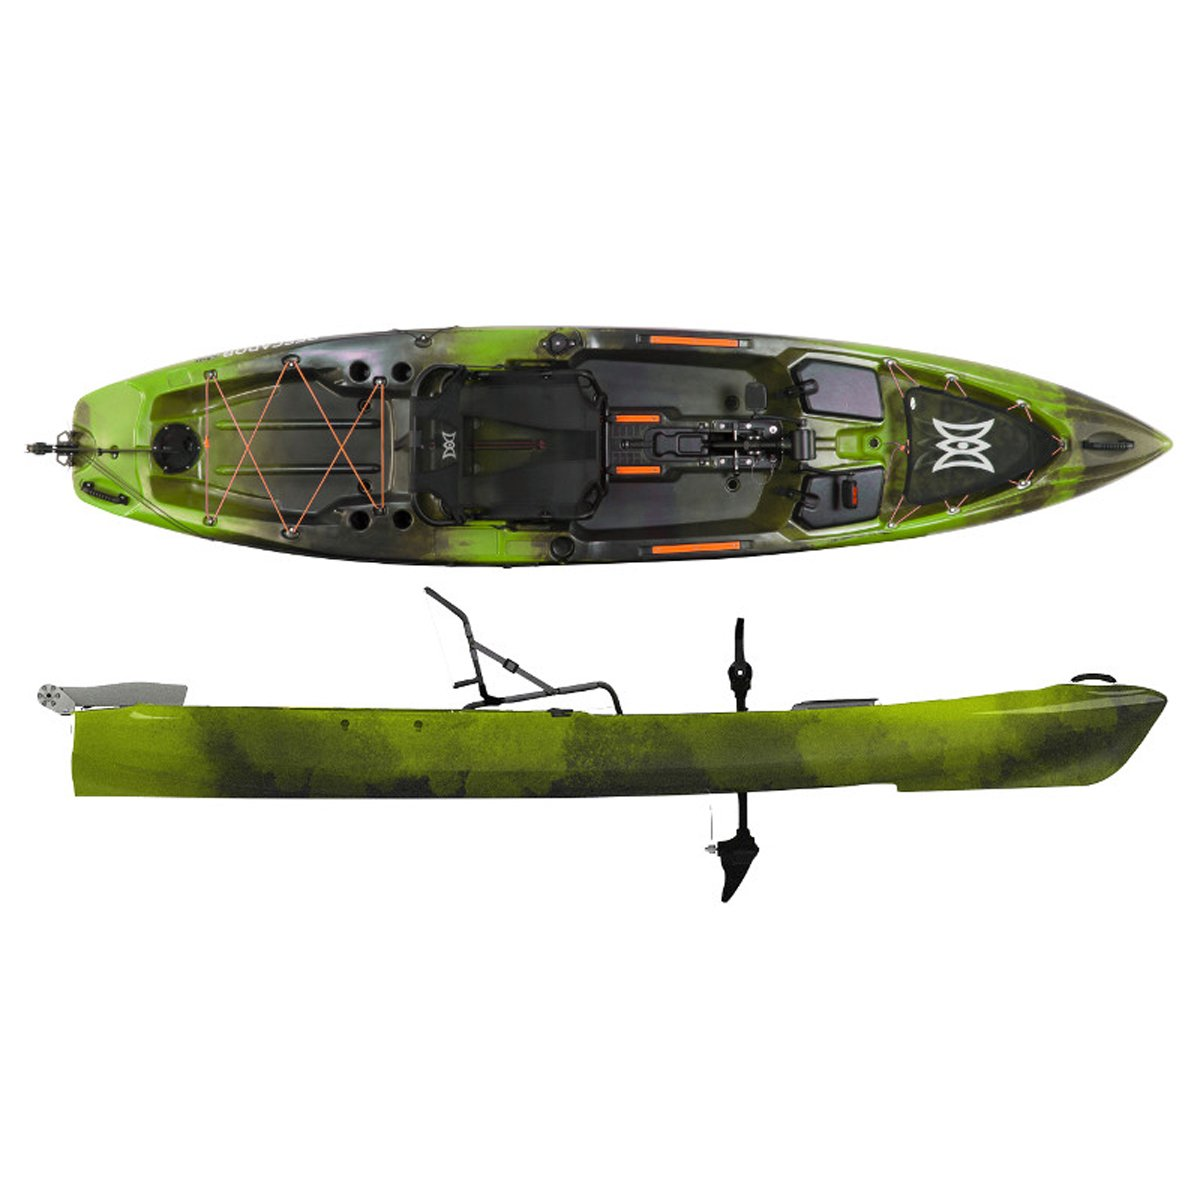 2017 Perception Pescador Pilot 12.0 Pedal Fishing Kayak (Moss Camo)